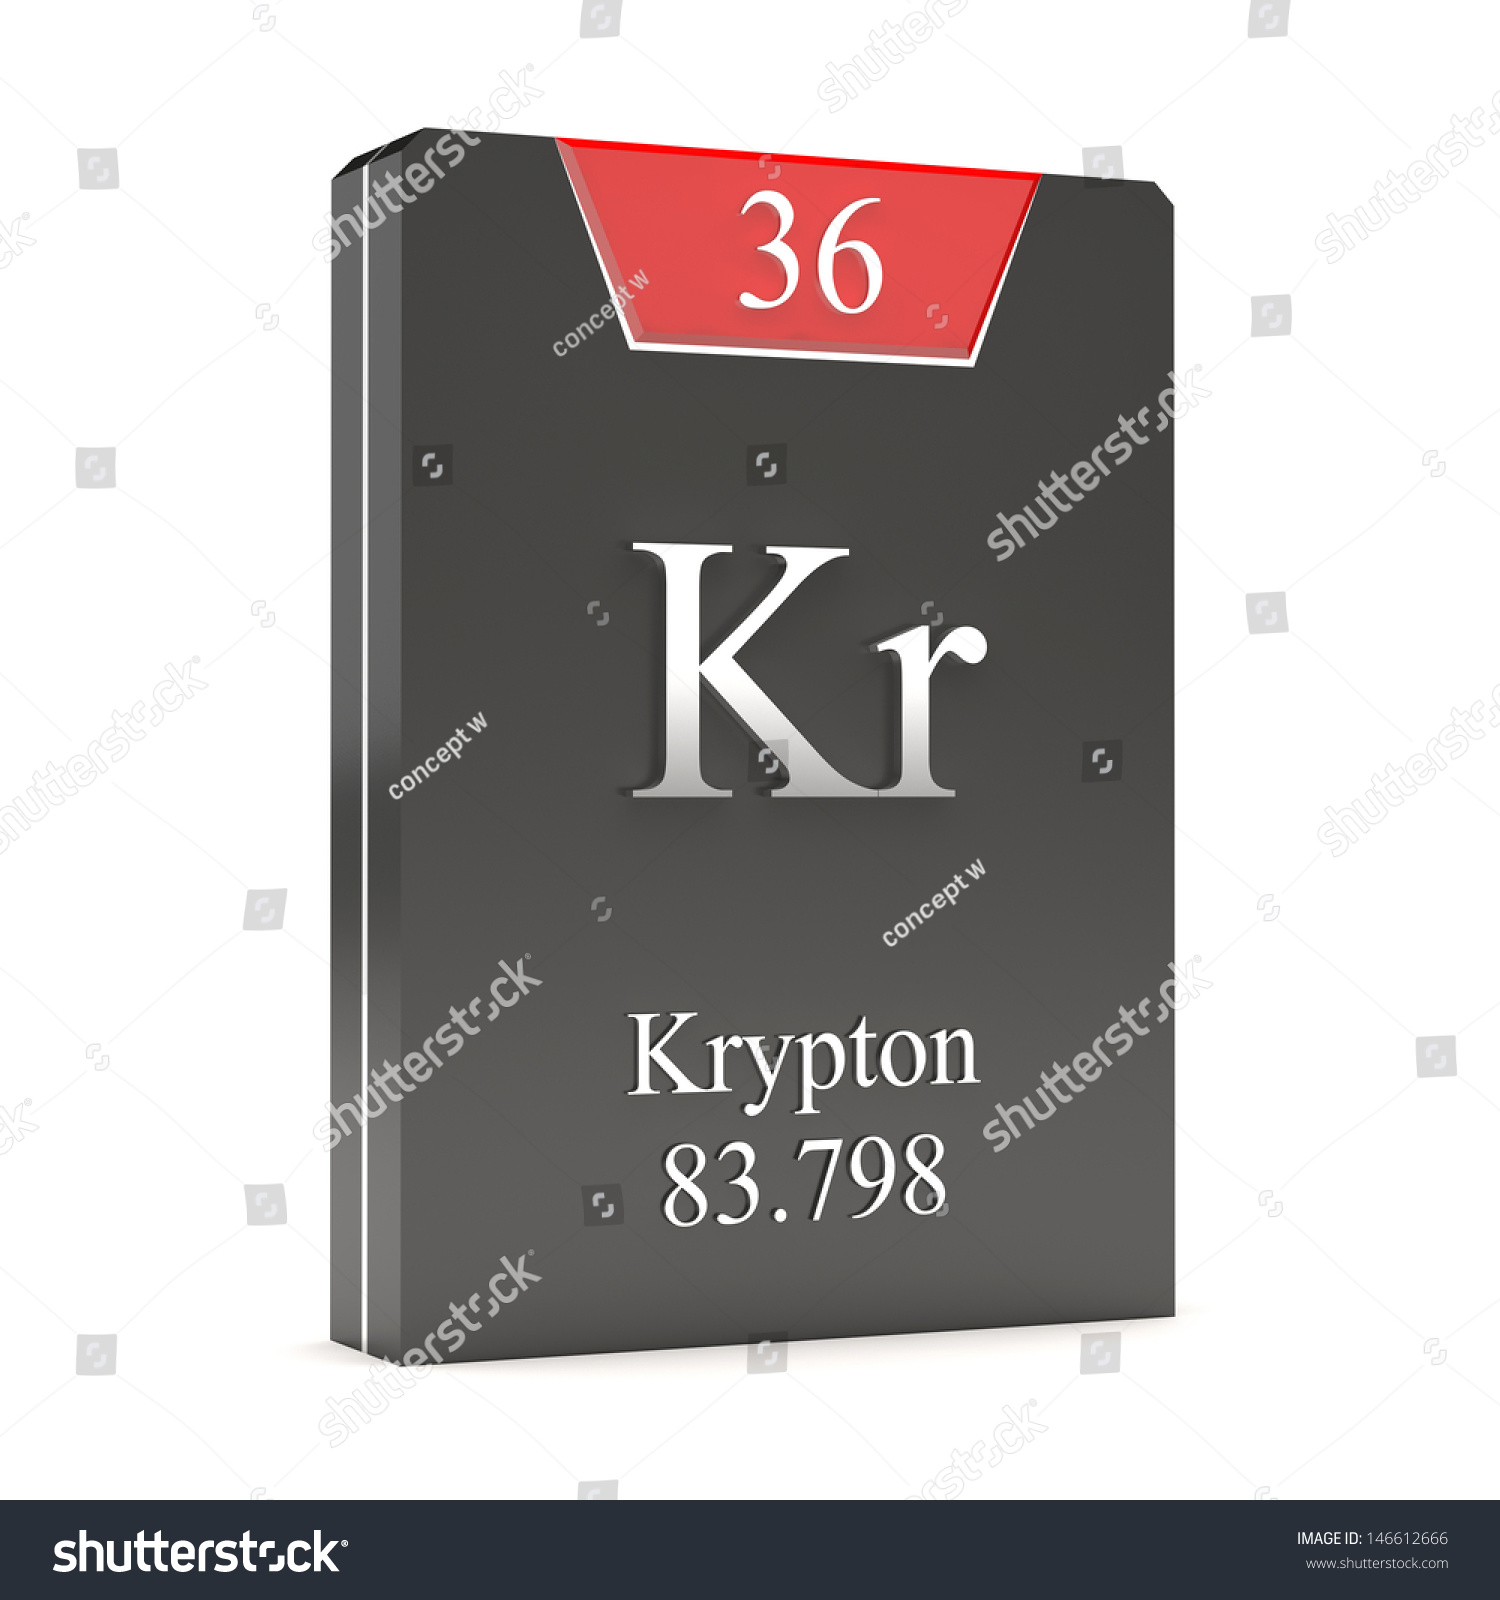 Krypton kr 36 periodic table stock illustration 146612666 shutterstock urtaz Choice Image